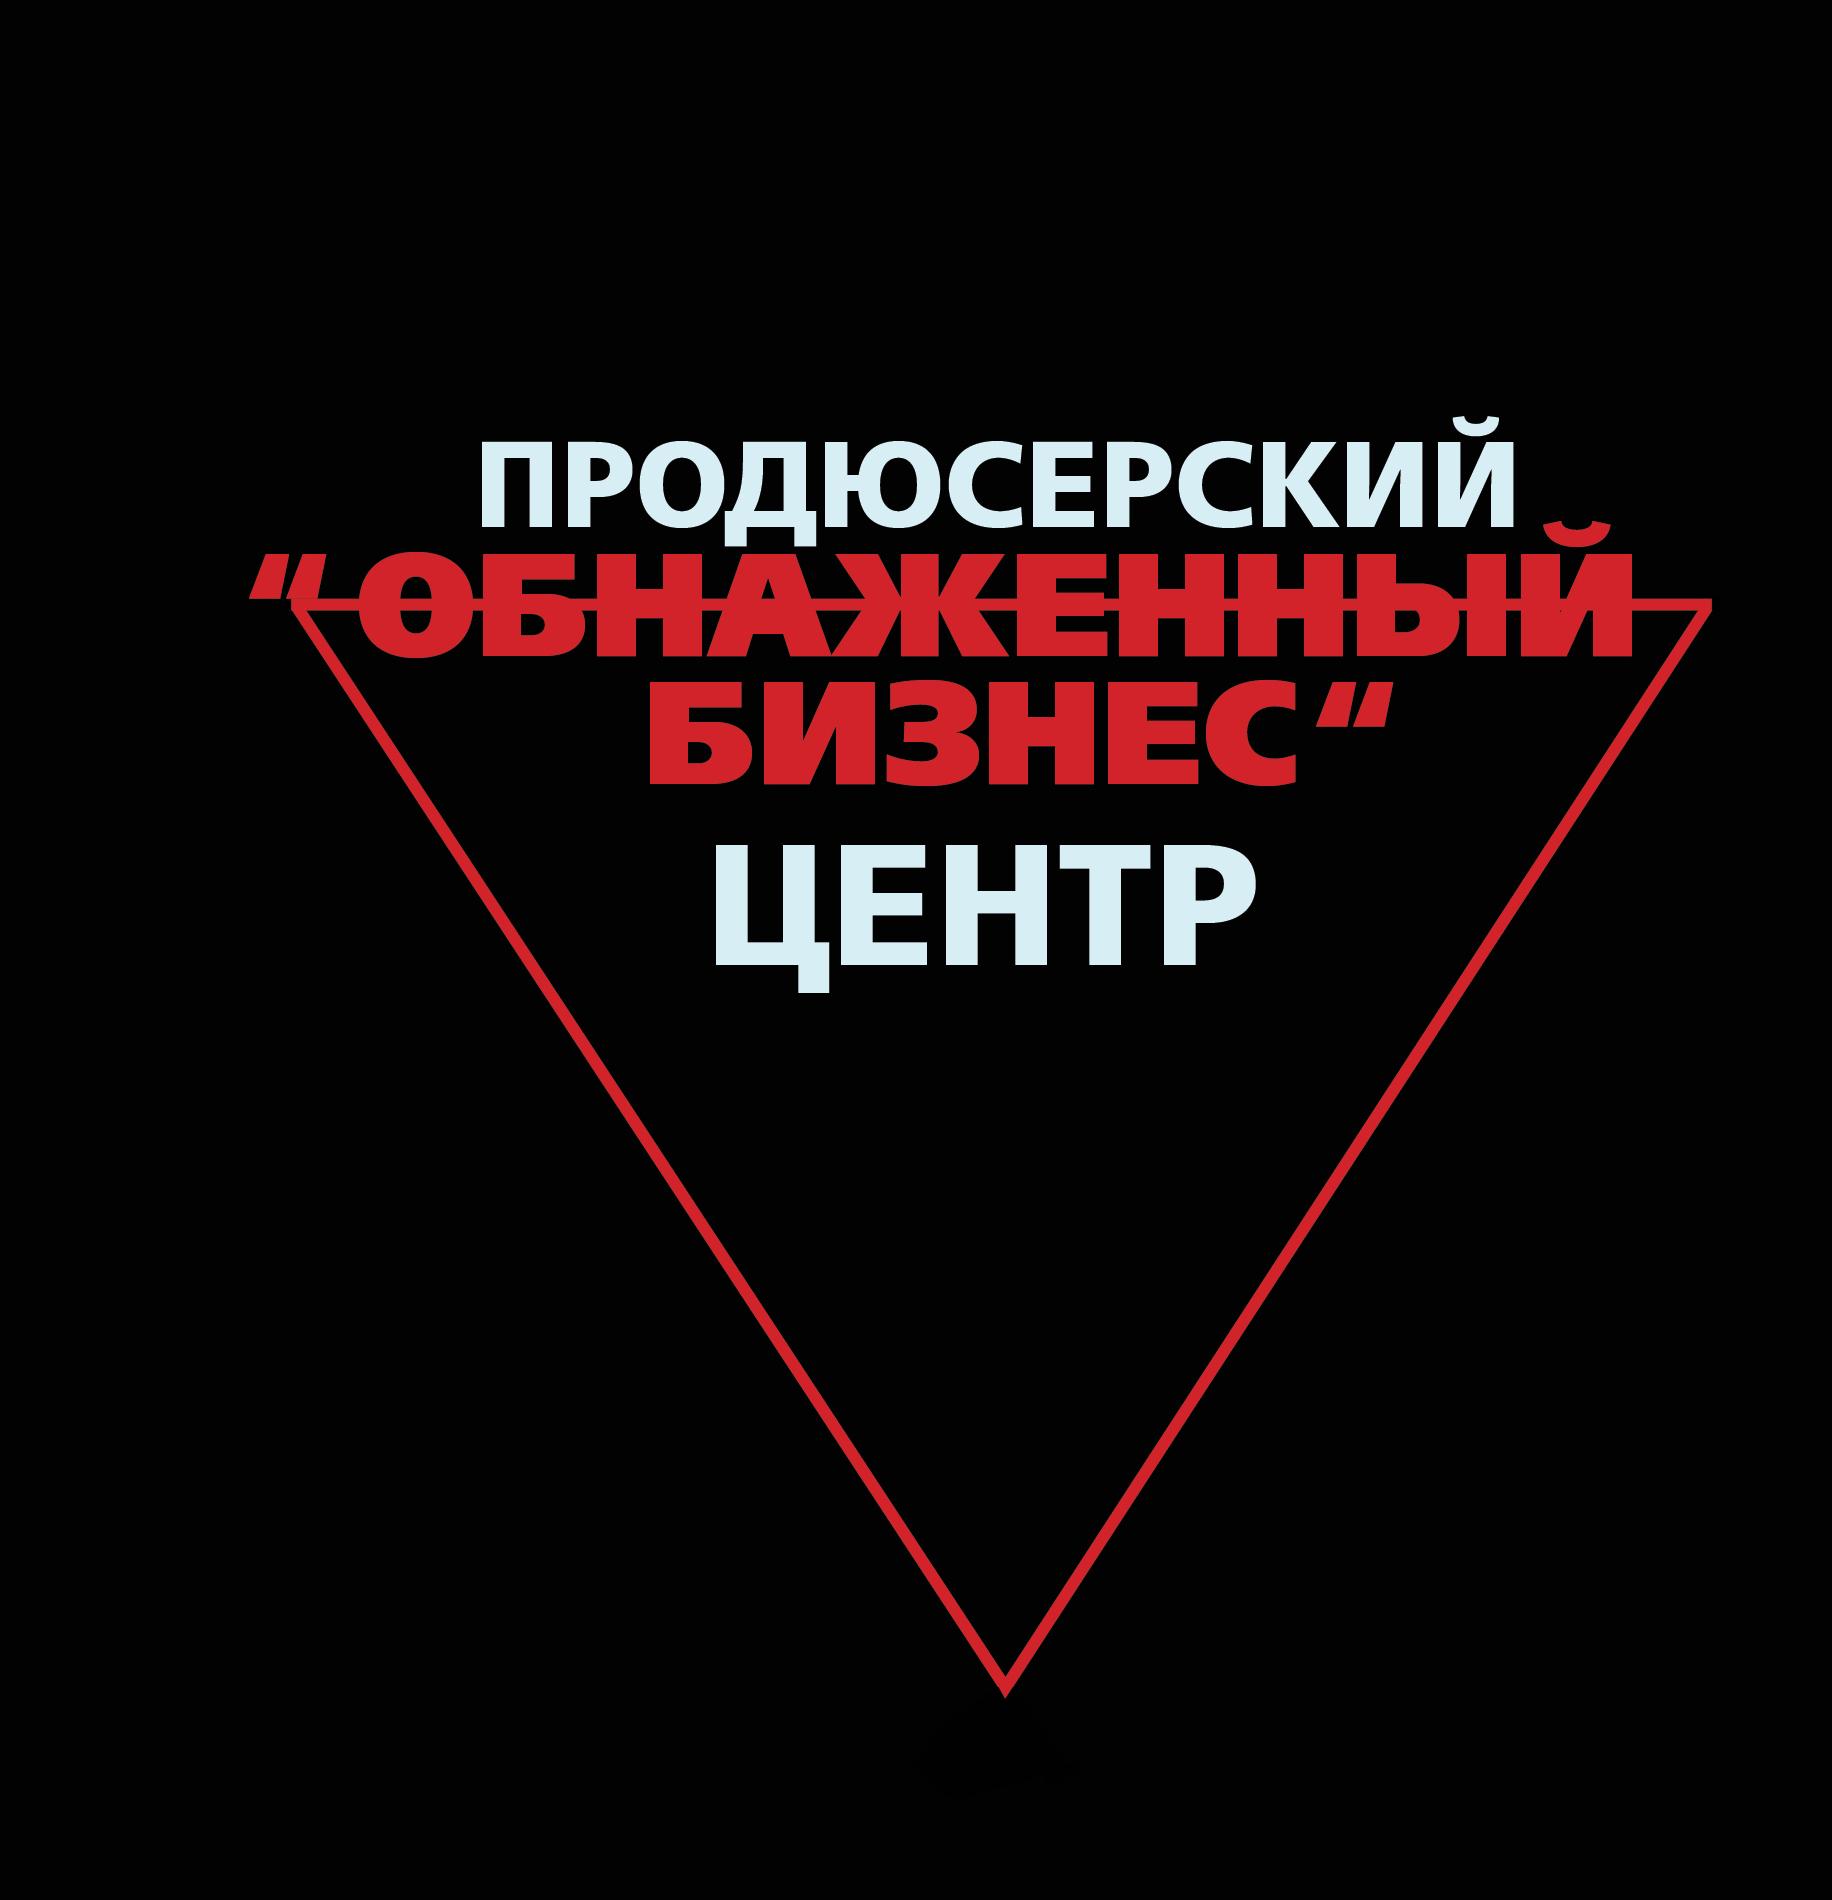 "Логотип для продюсерского центра ""Обнажённый бизнес"" фото f_7985ba1562a06048.jpg"